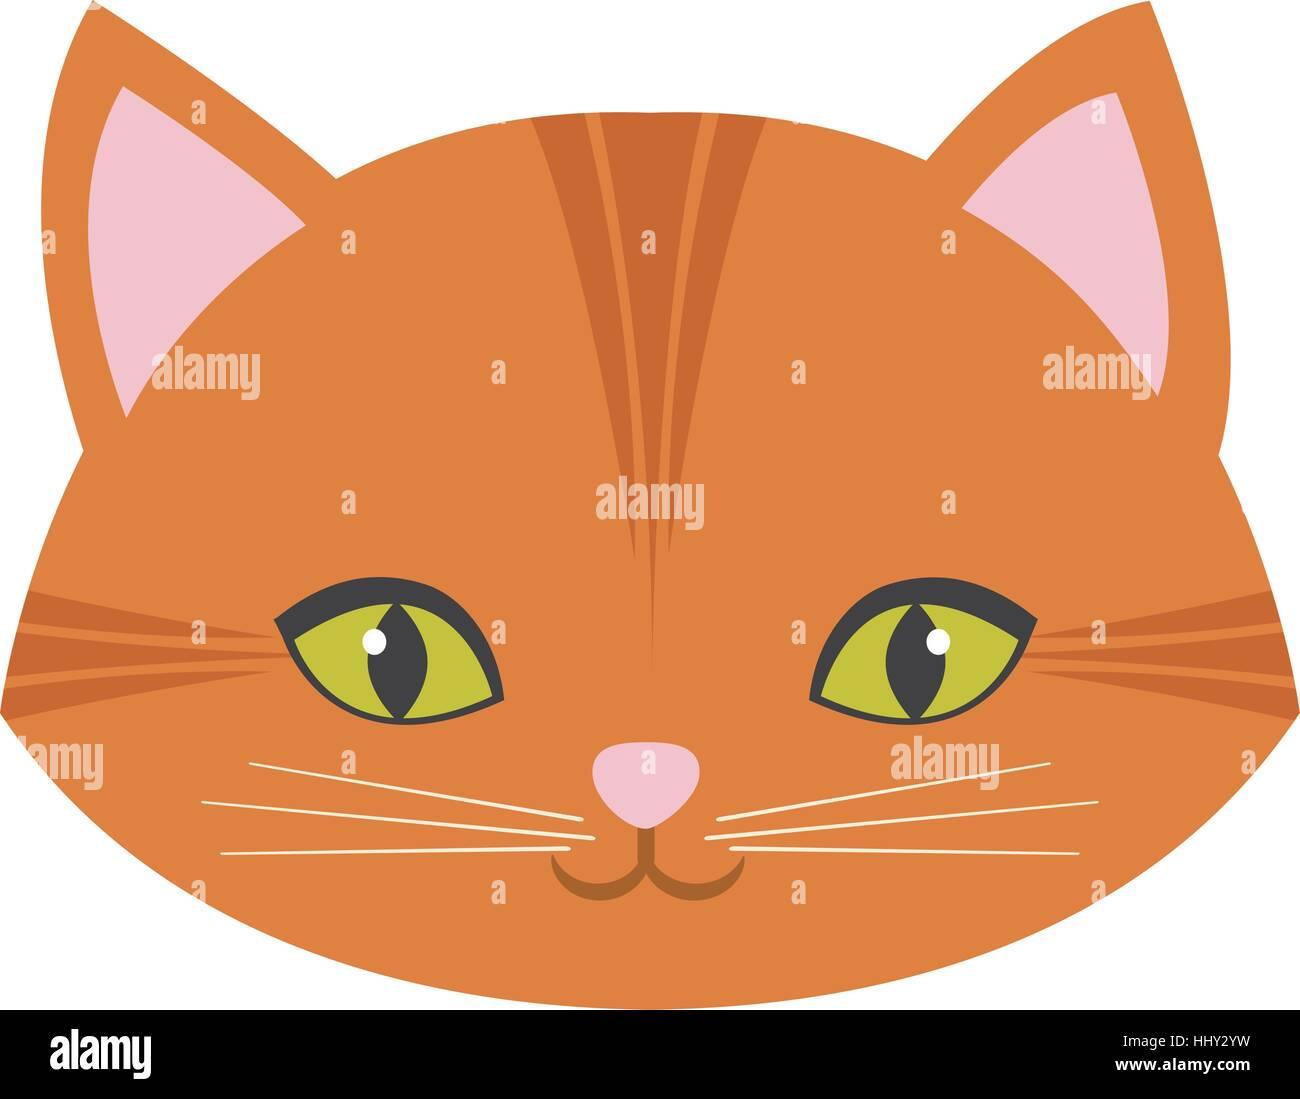 cute cat face pink nose mustache stock vector art illustration